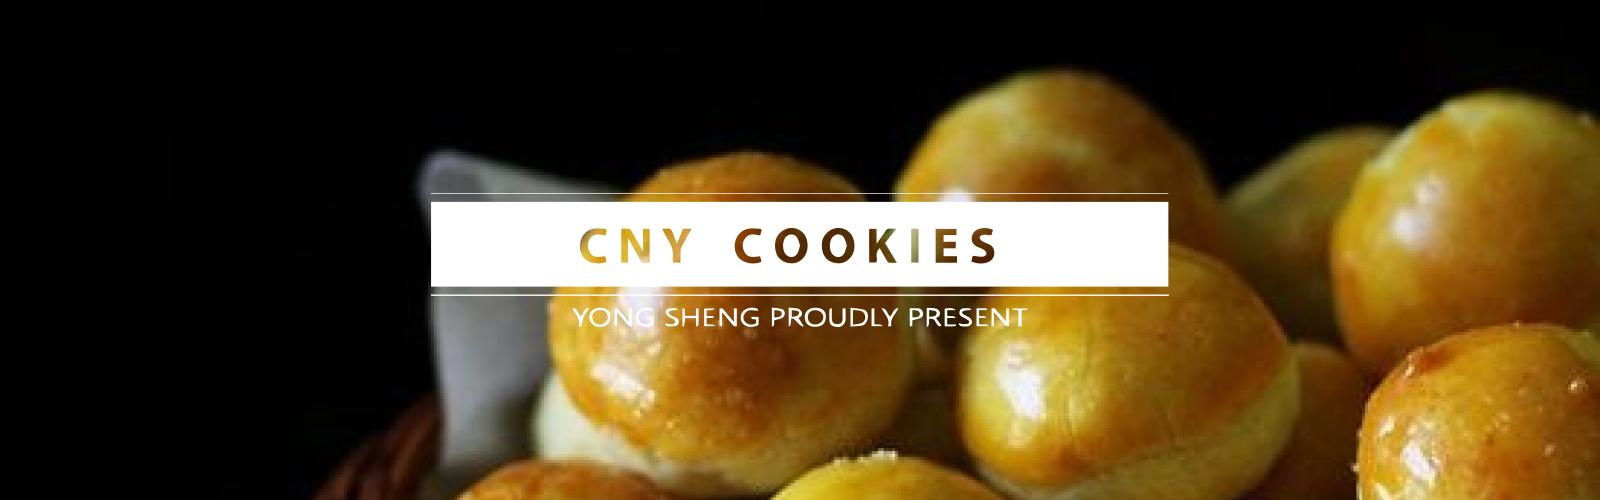 CNY Cookies Banner